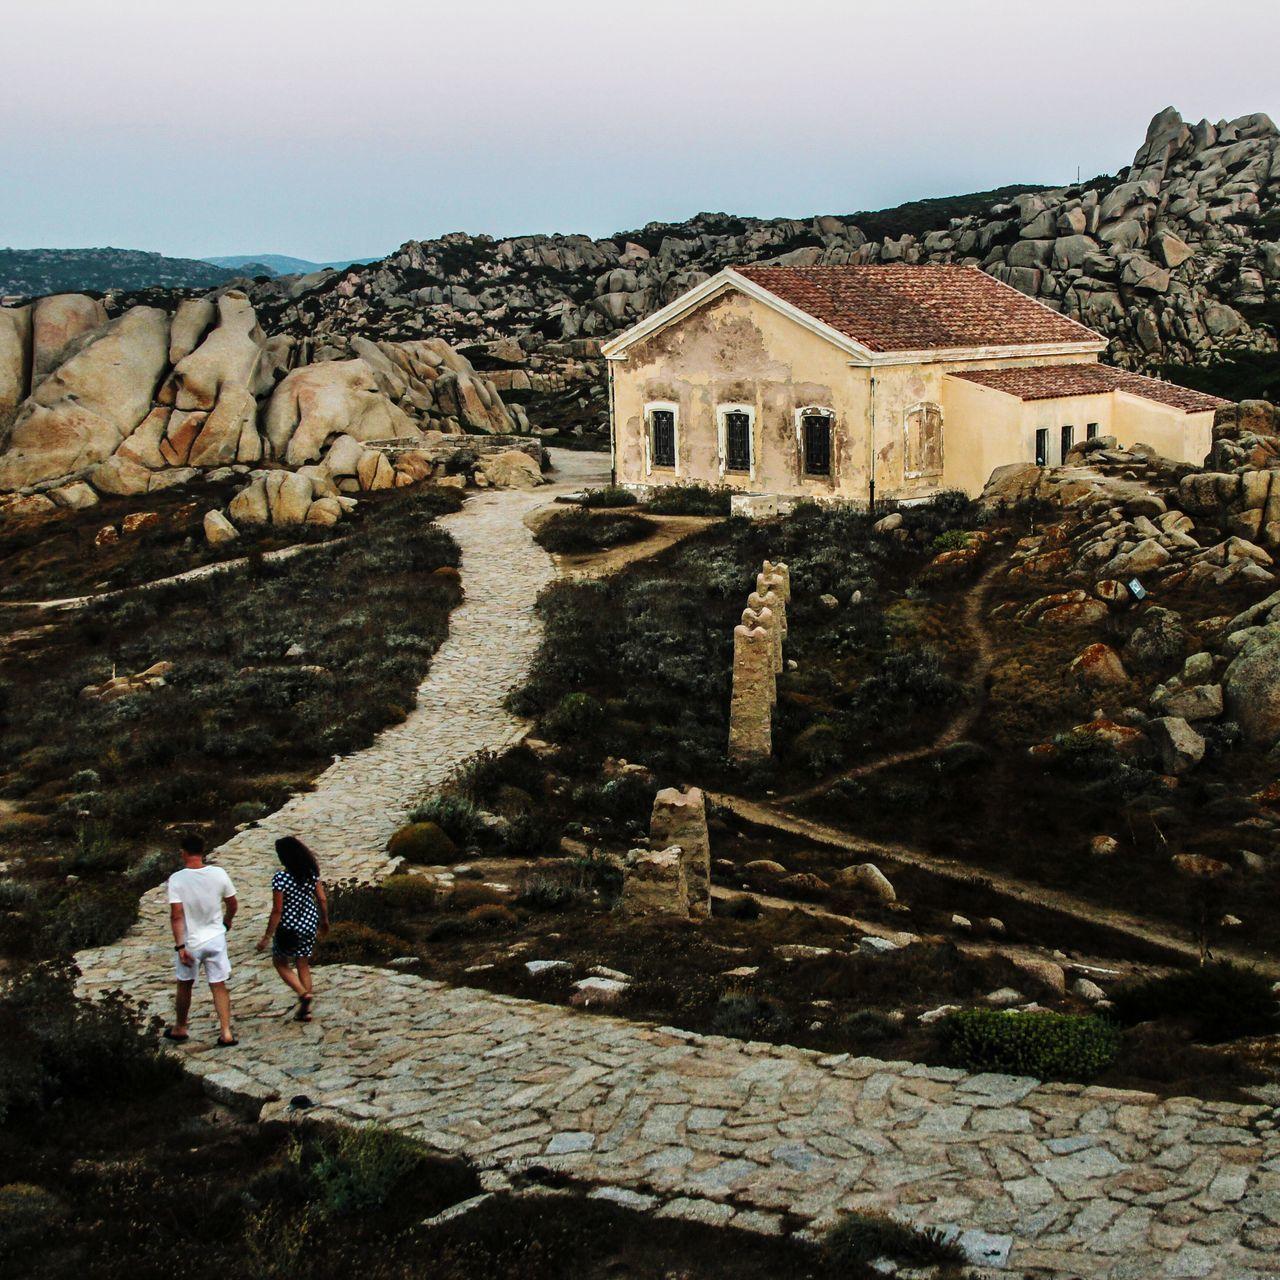 Sardegna Santateresadigallura Faro Capotesta